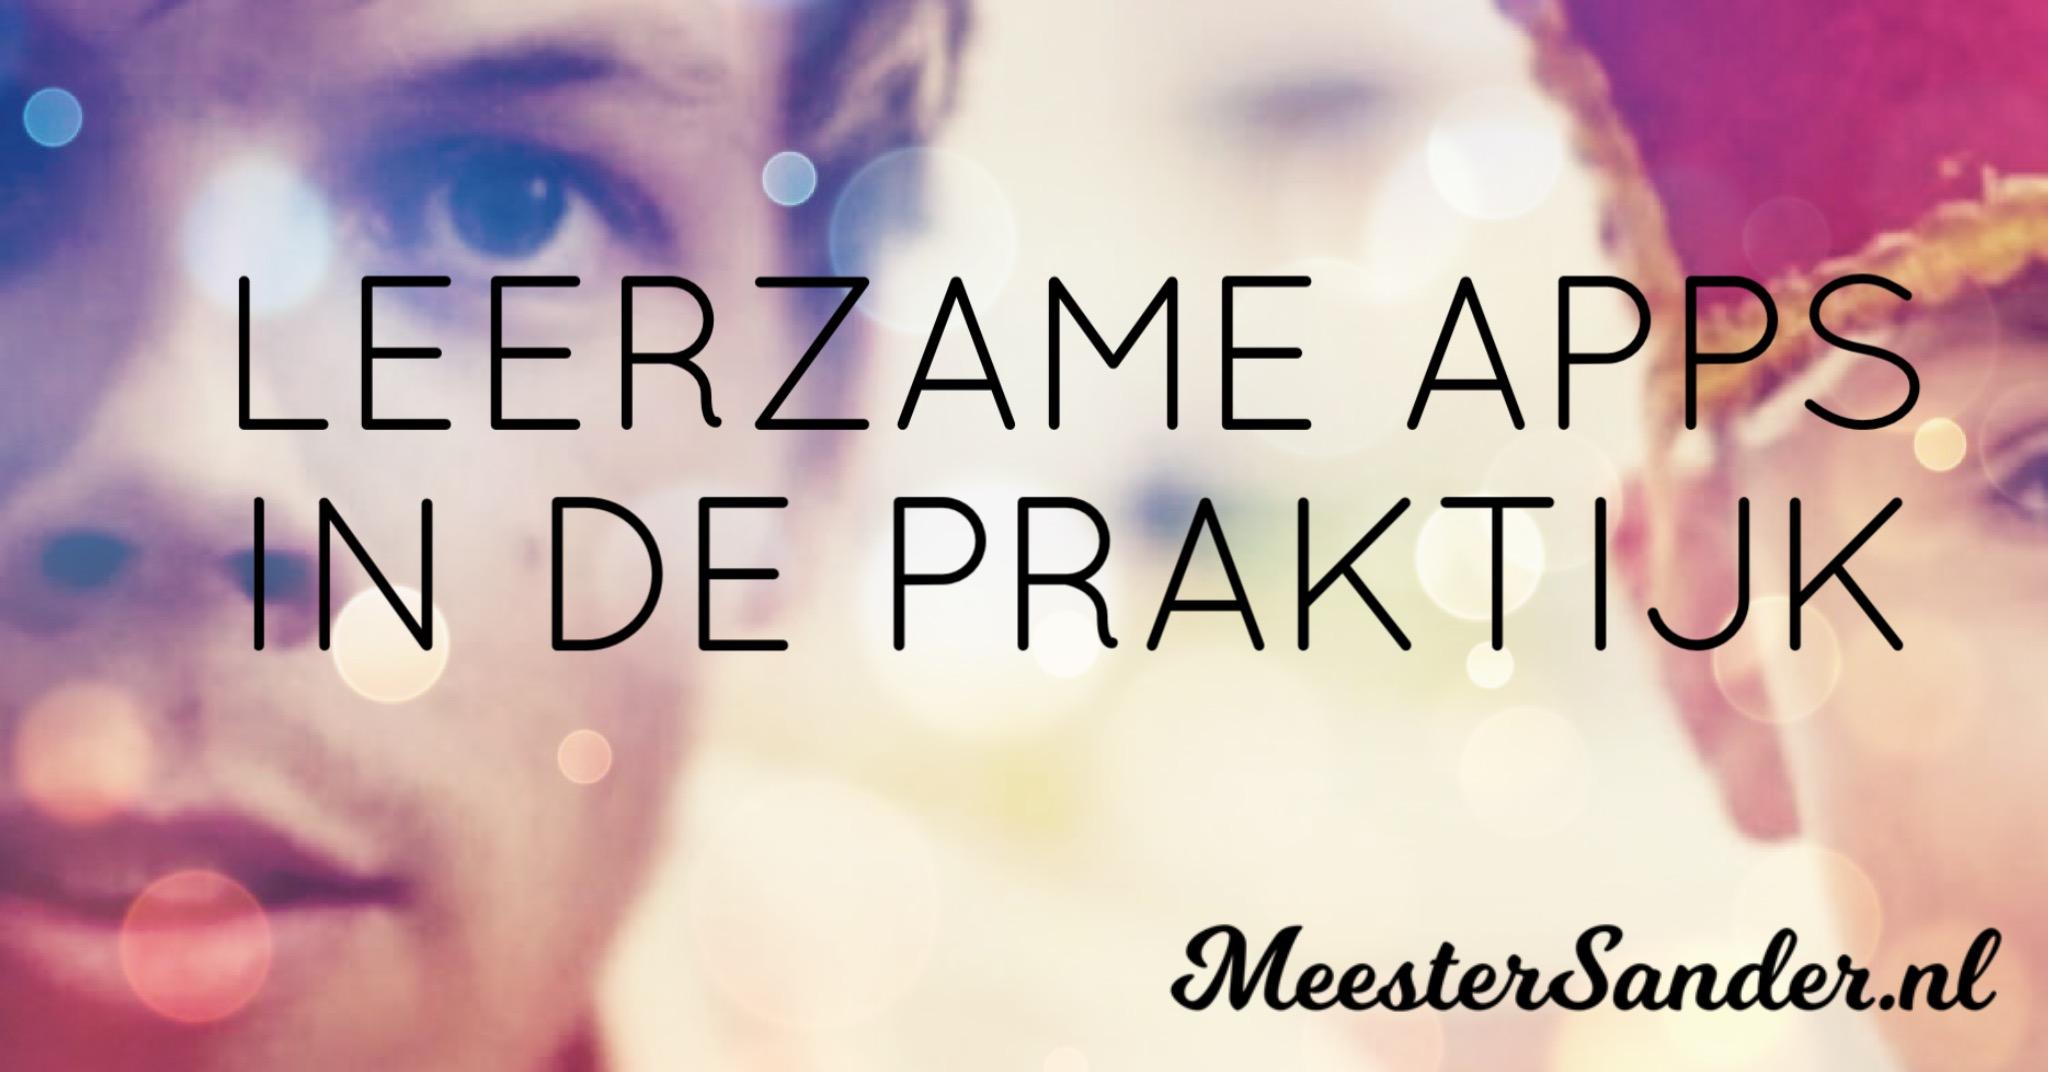 MeesterSander.nl